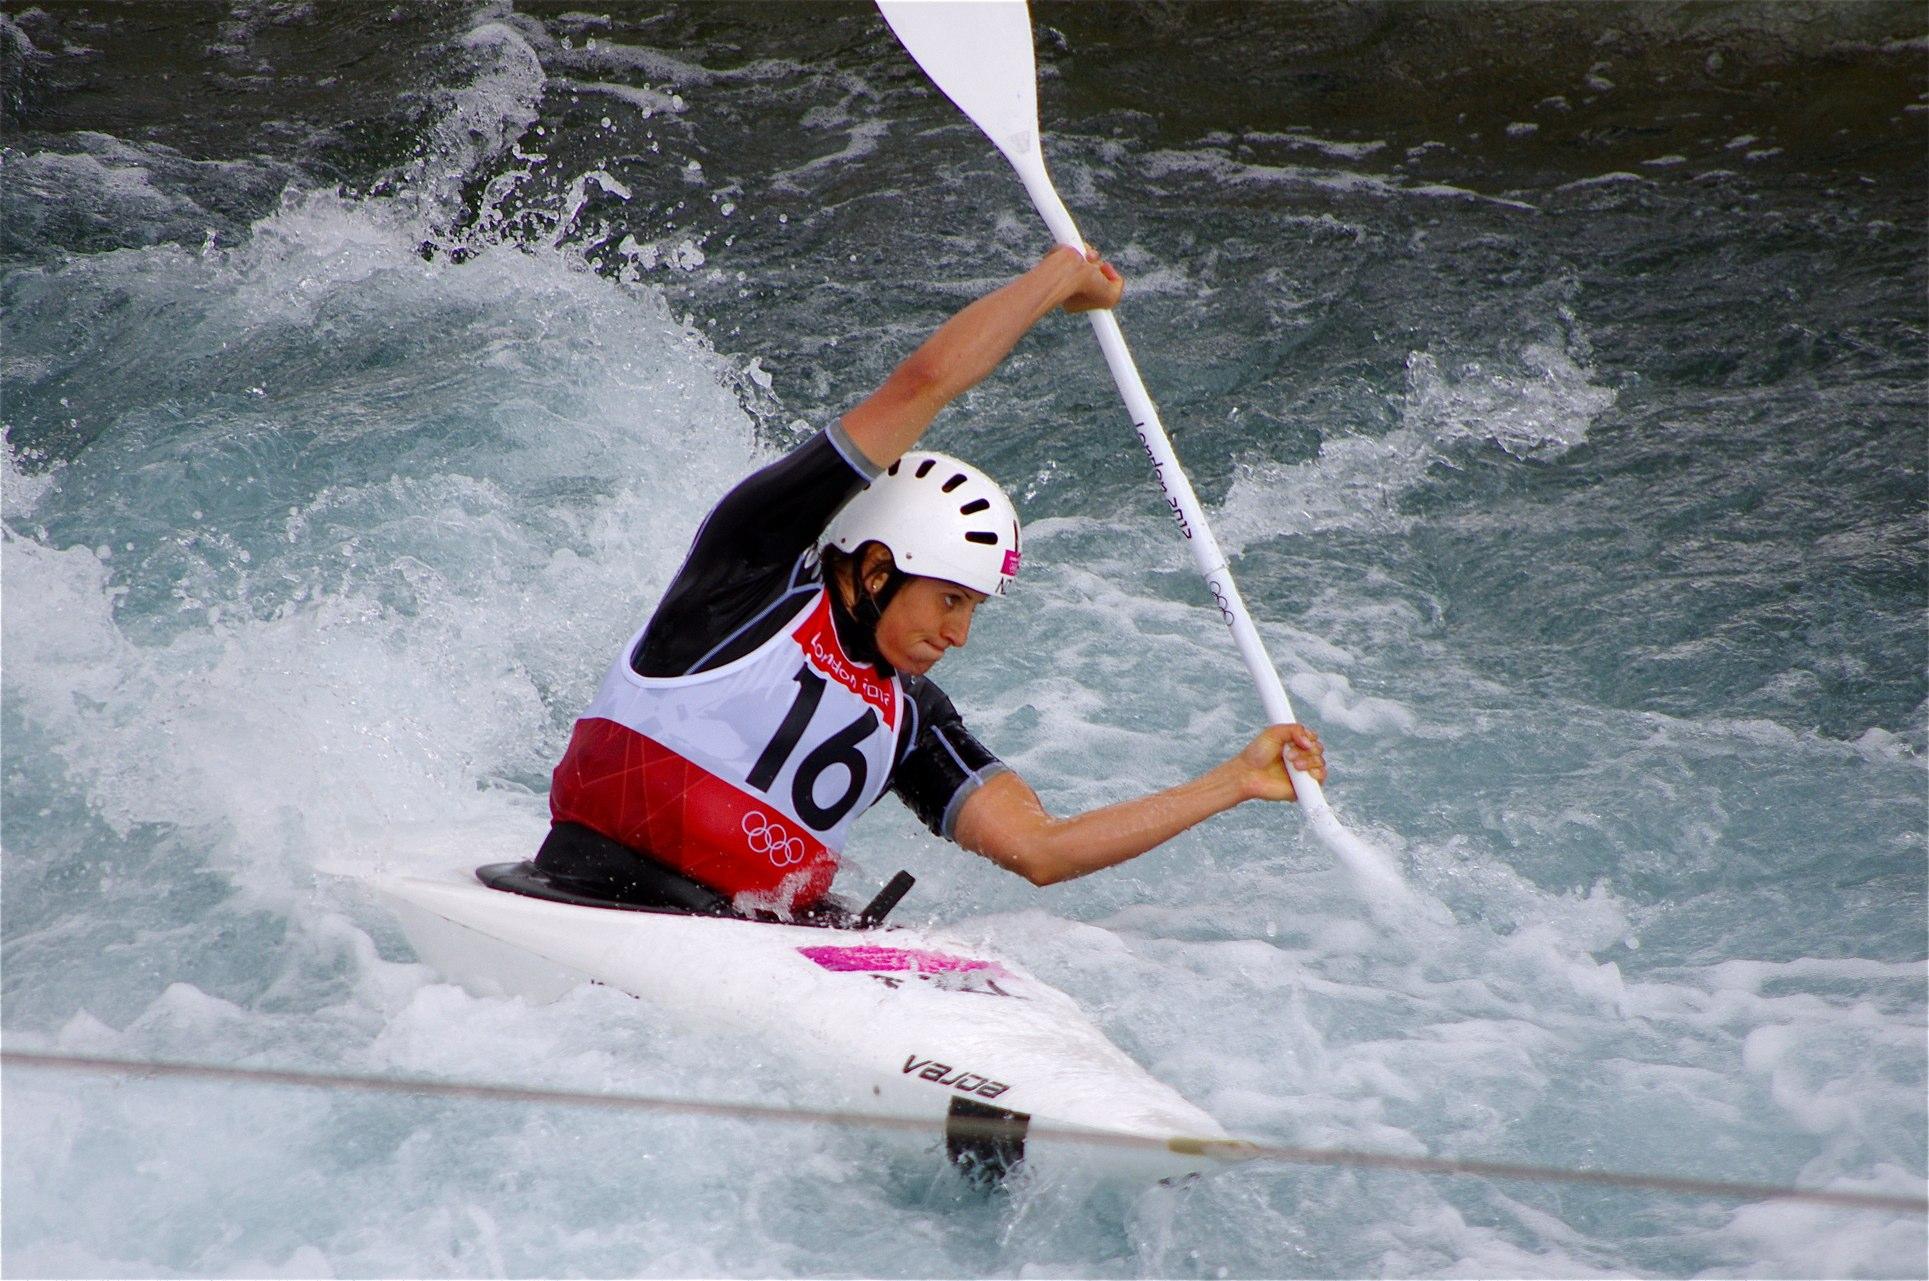 FileSlalom Canoeing 2012 Olympics W K1 NZL Luuka Jones